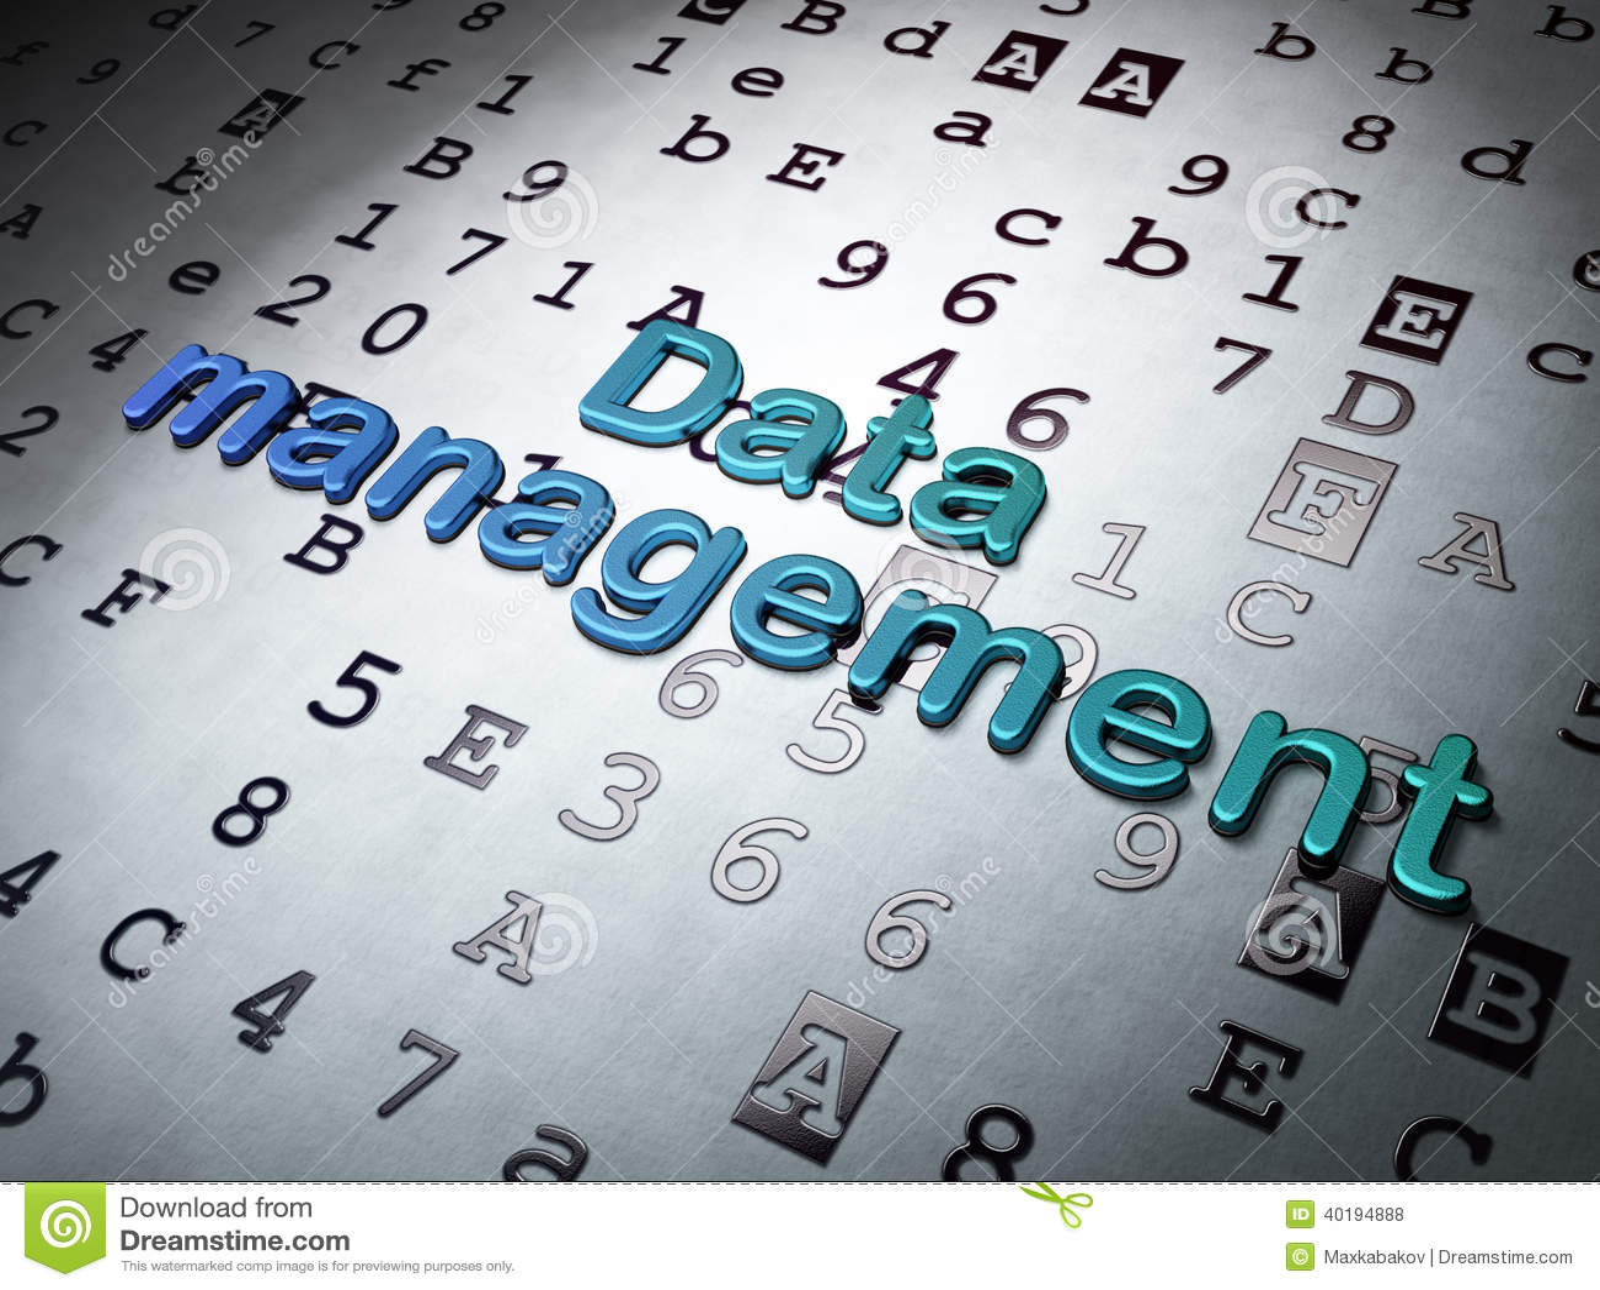 Information concept: Data Management on Hexadecimal Code background